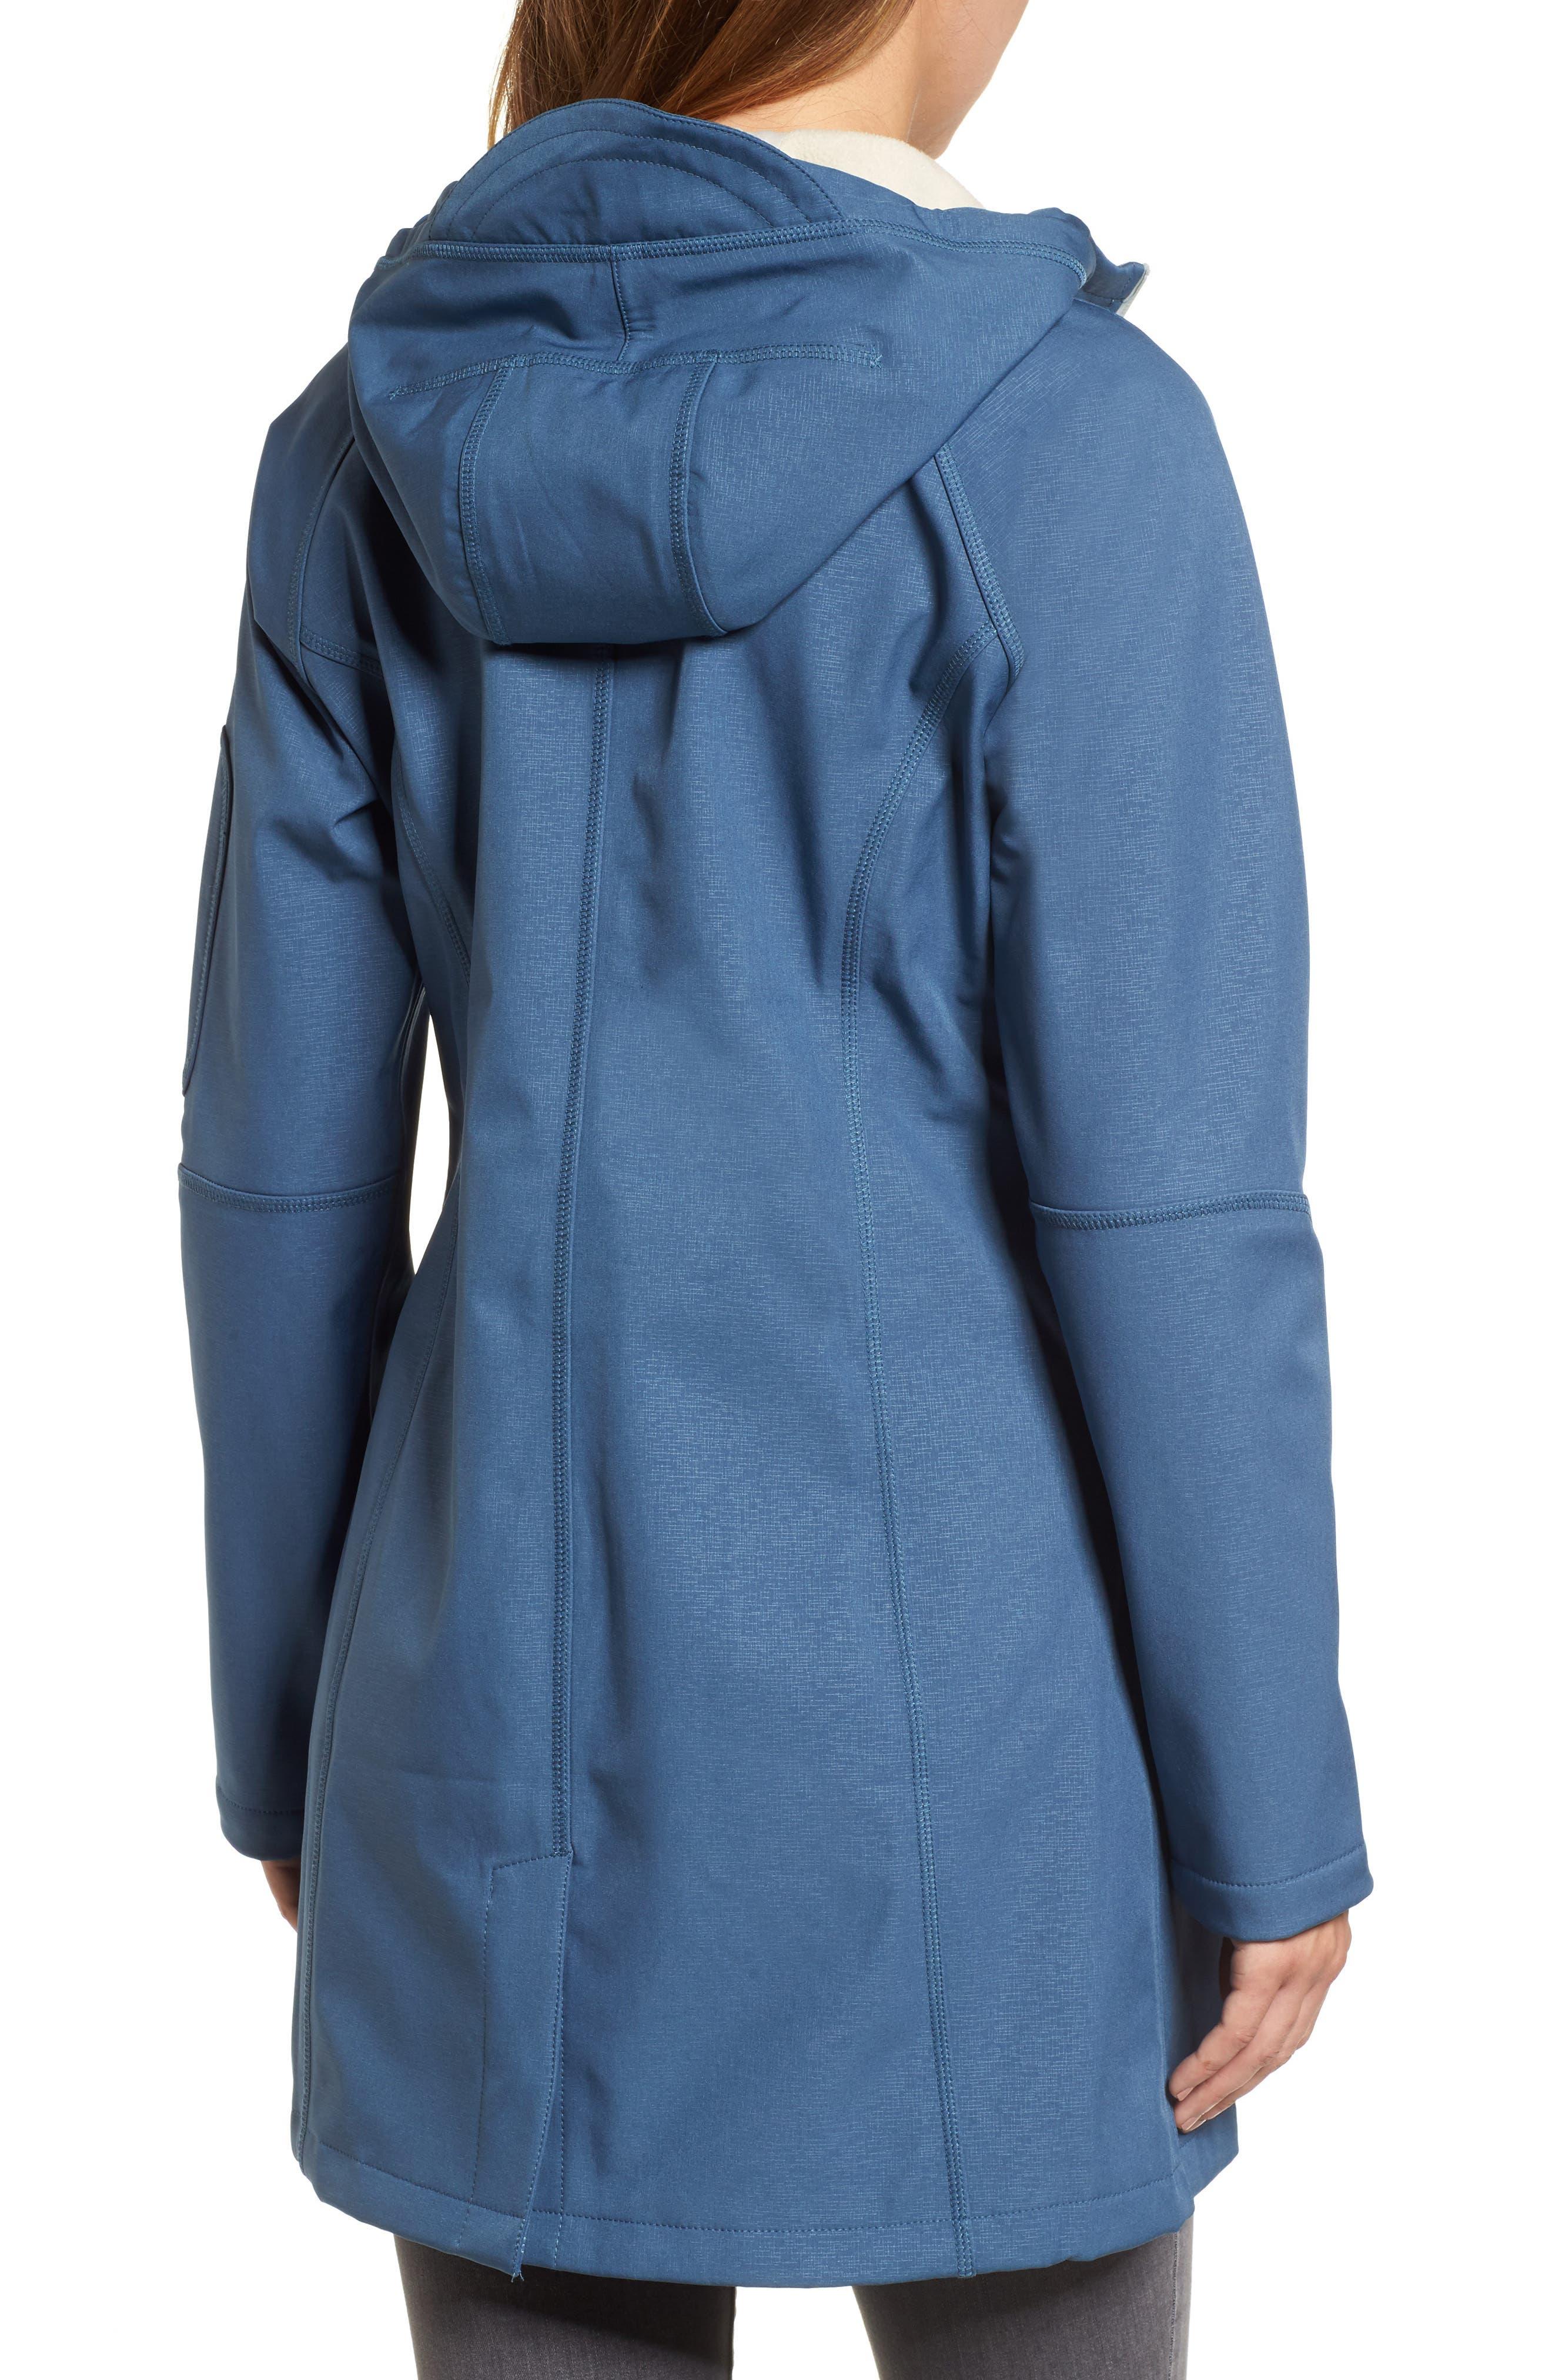 Regular Fit Hooded Raincoat,                             Alternate thumbnail 2, color,                             400